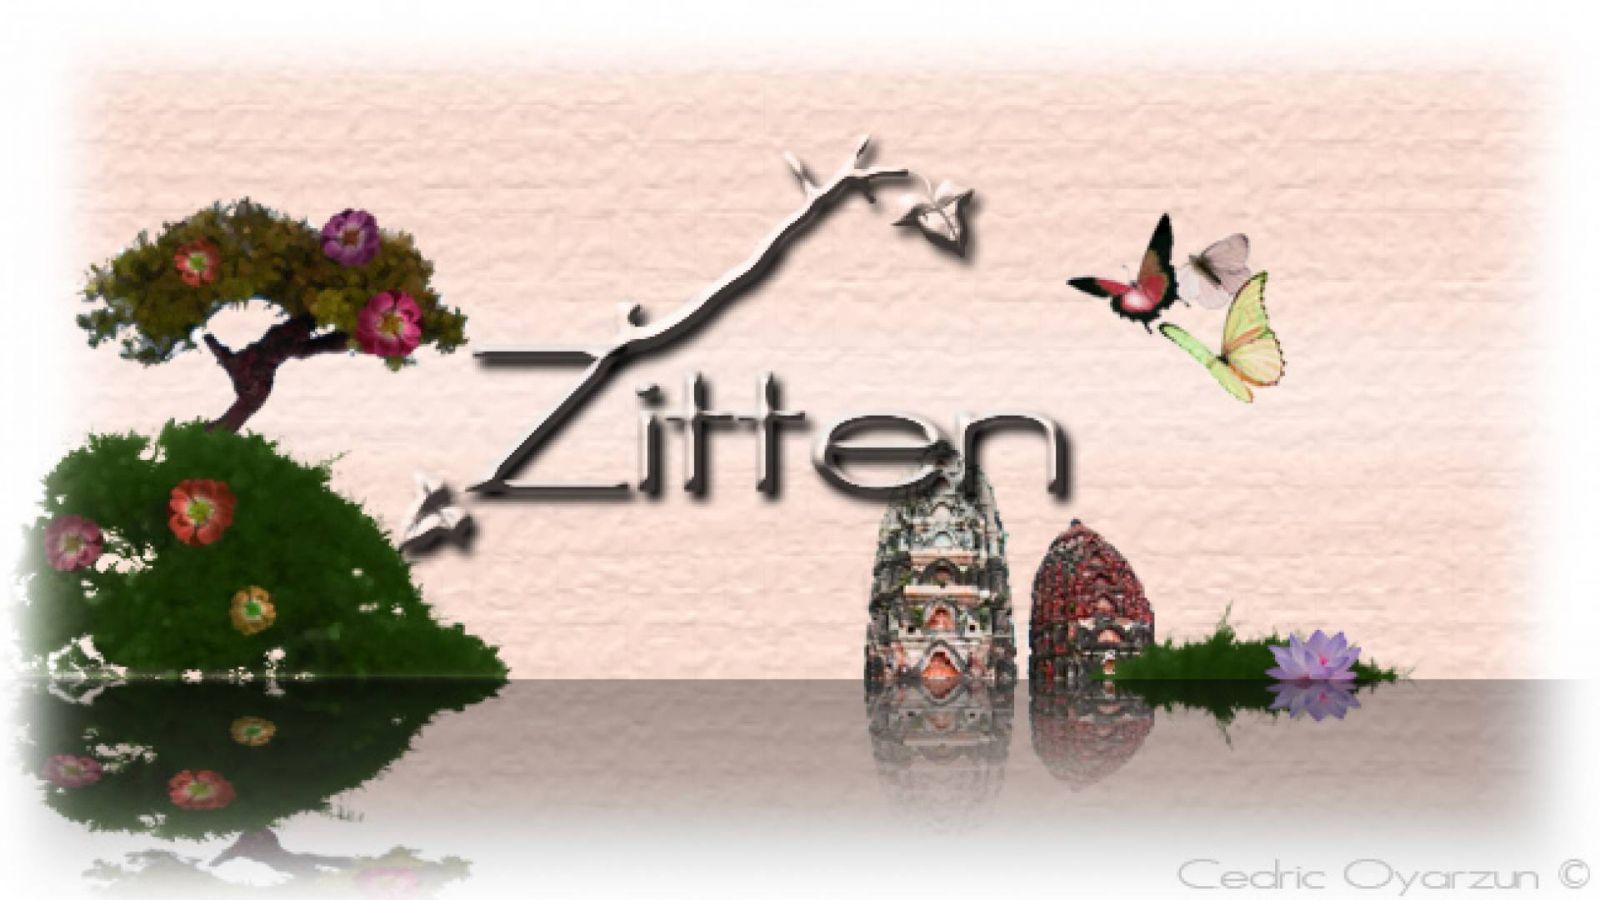 Interview with Zitten © Cedric Oyarzun